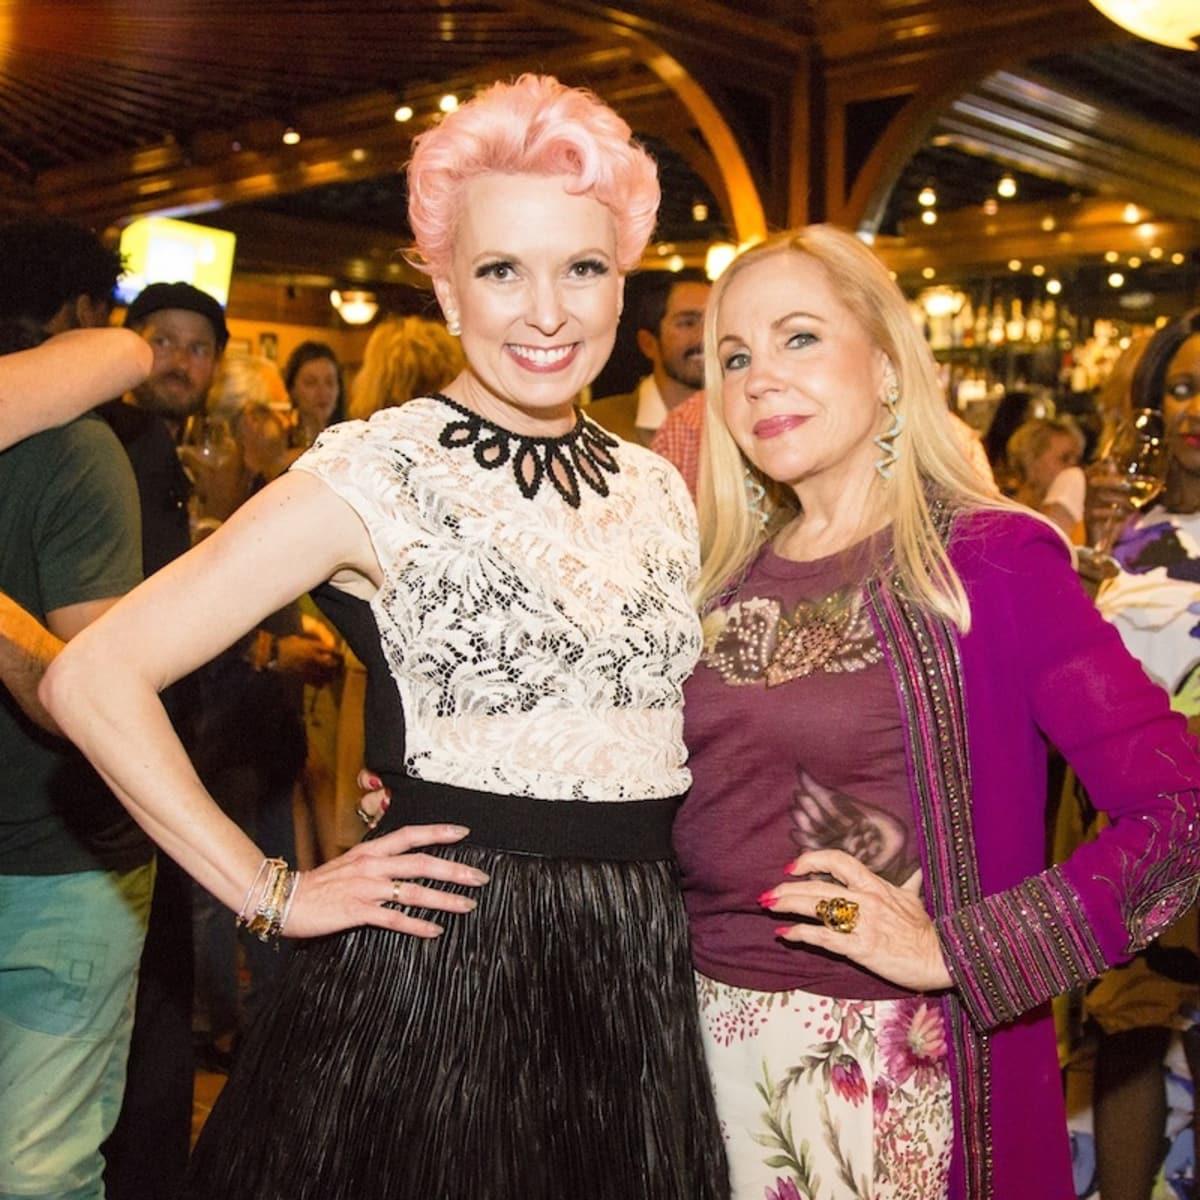 News, Shelby, Beth Muecek b'day, Oct. 2015, Vivian Wise, Carolyn Farb